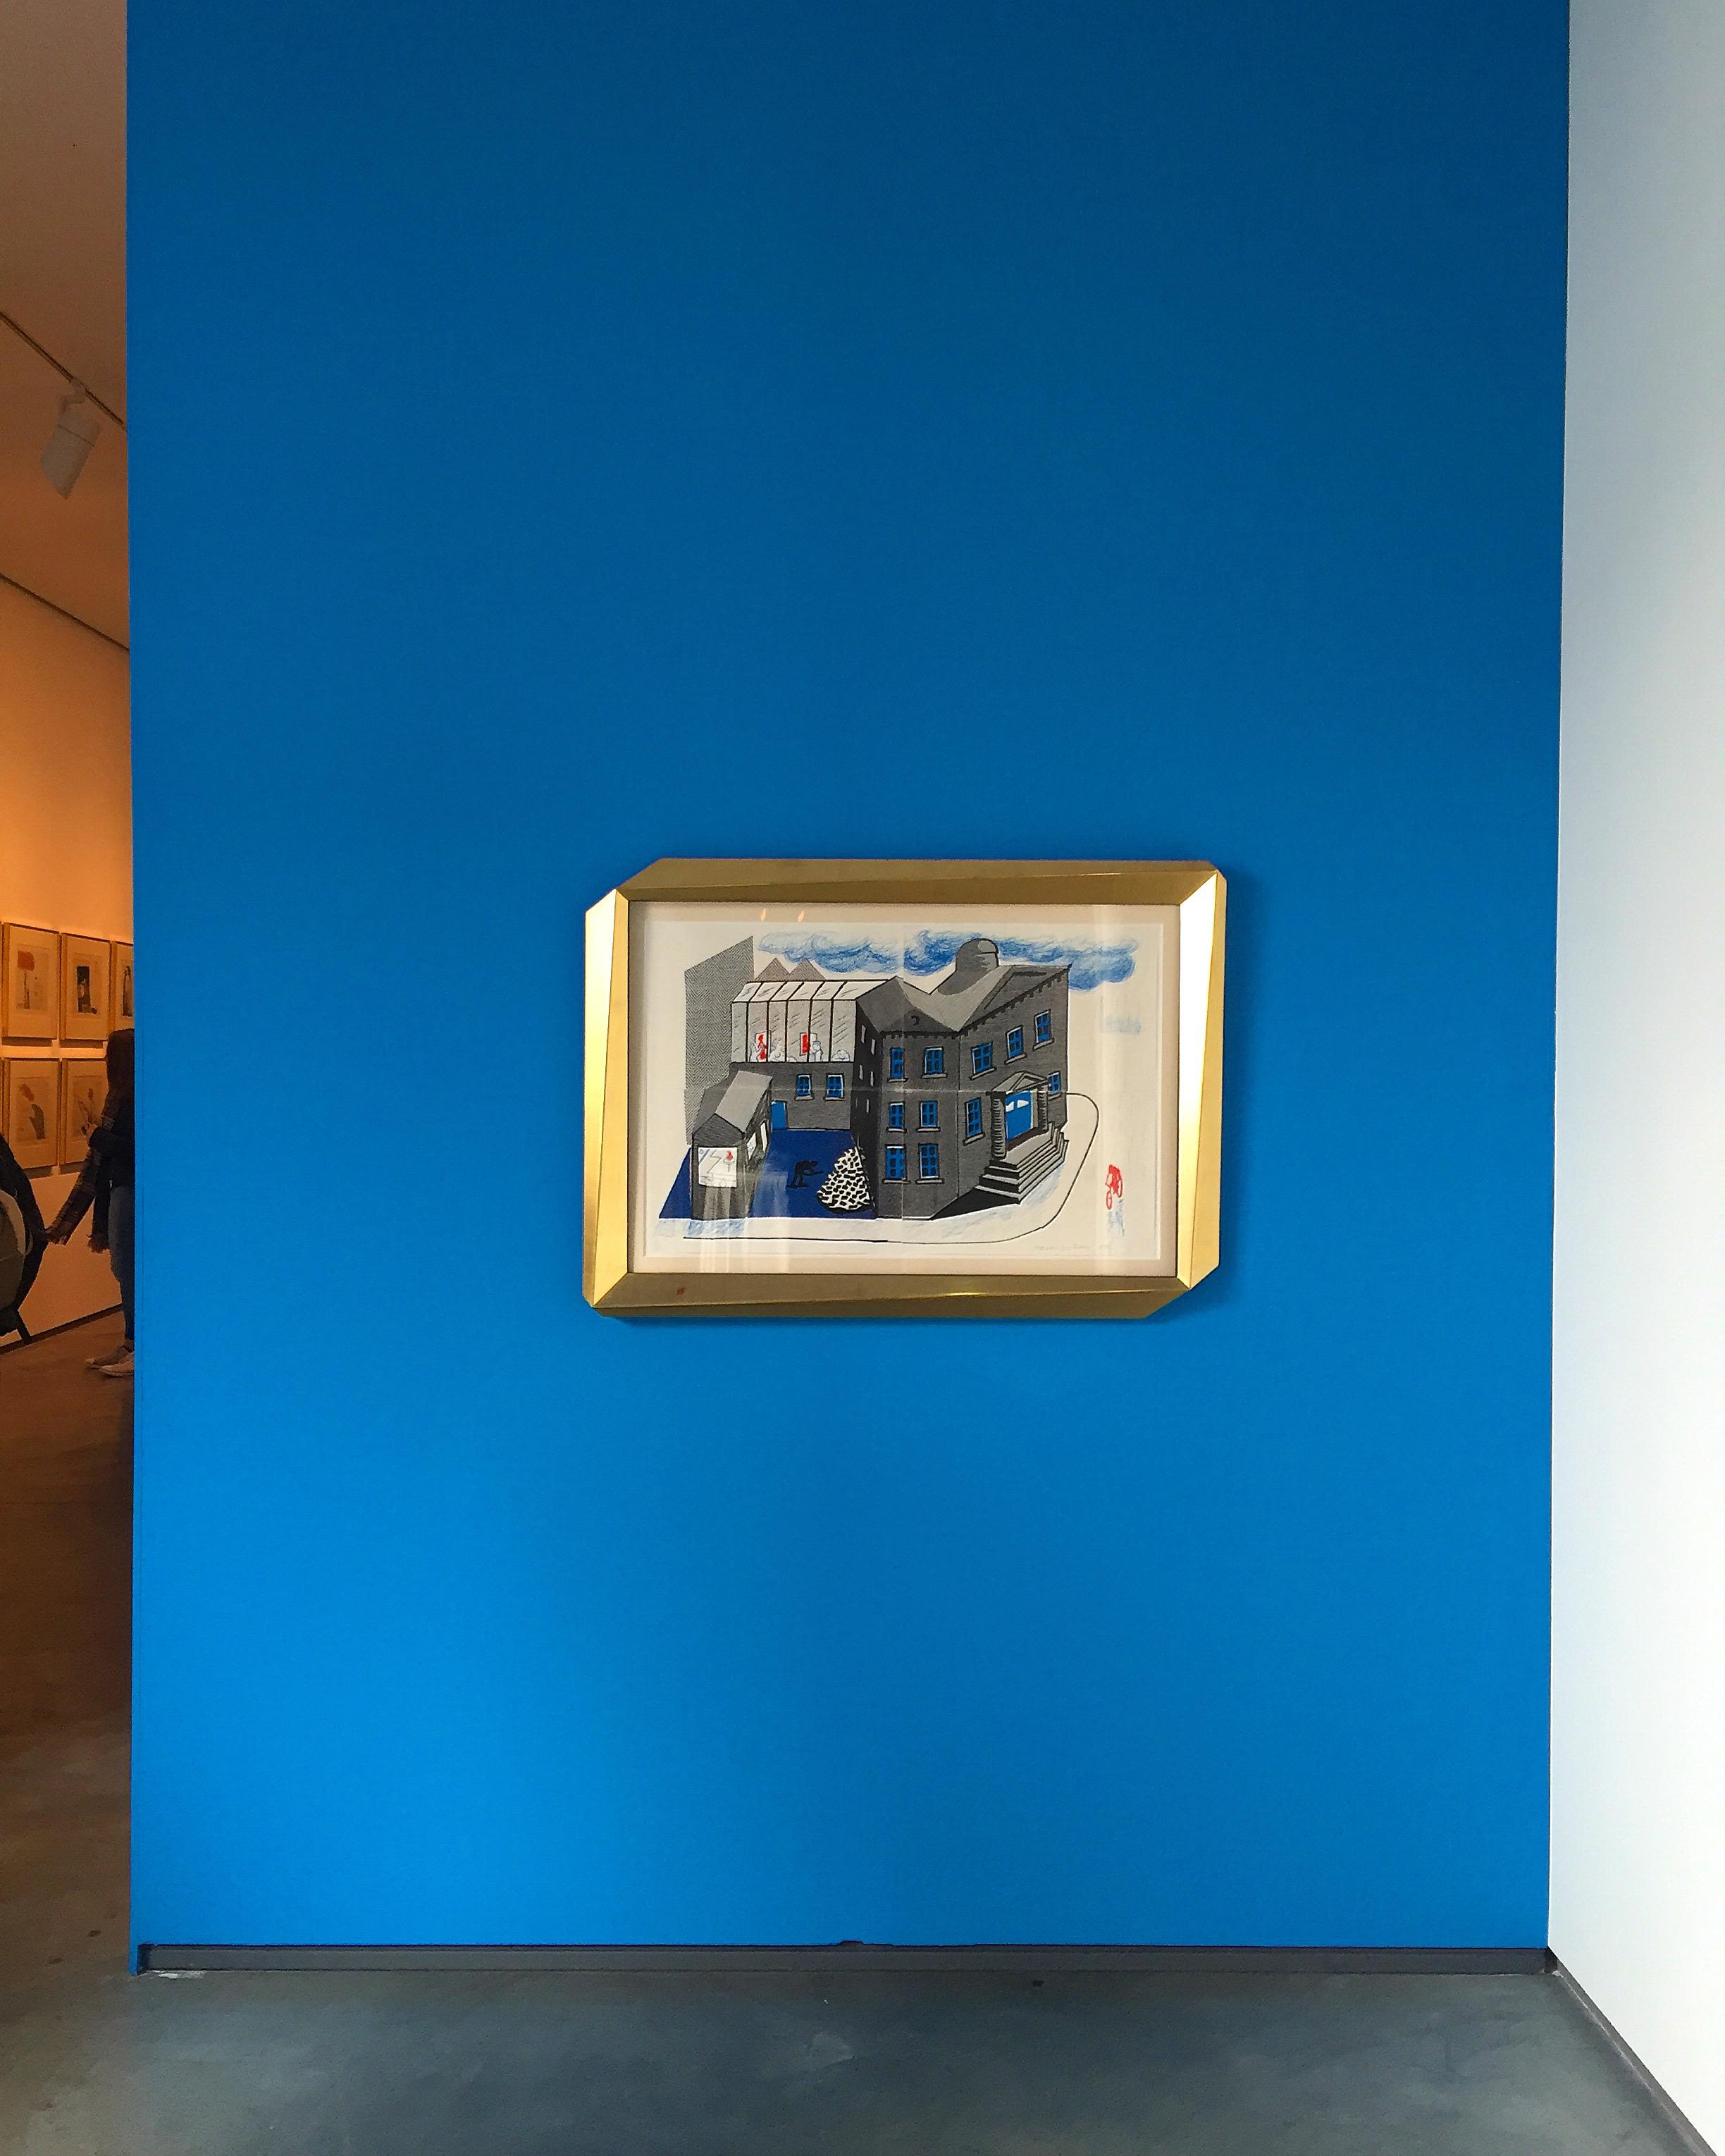 hockney_painting_tall_gallery_the_mac_belfast_northern_ireland_ni_explorer_niexplorer